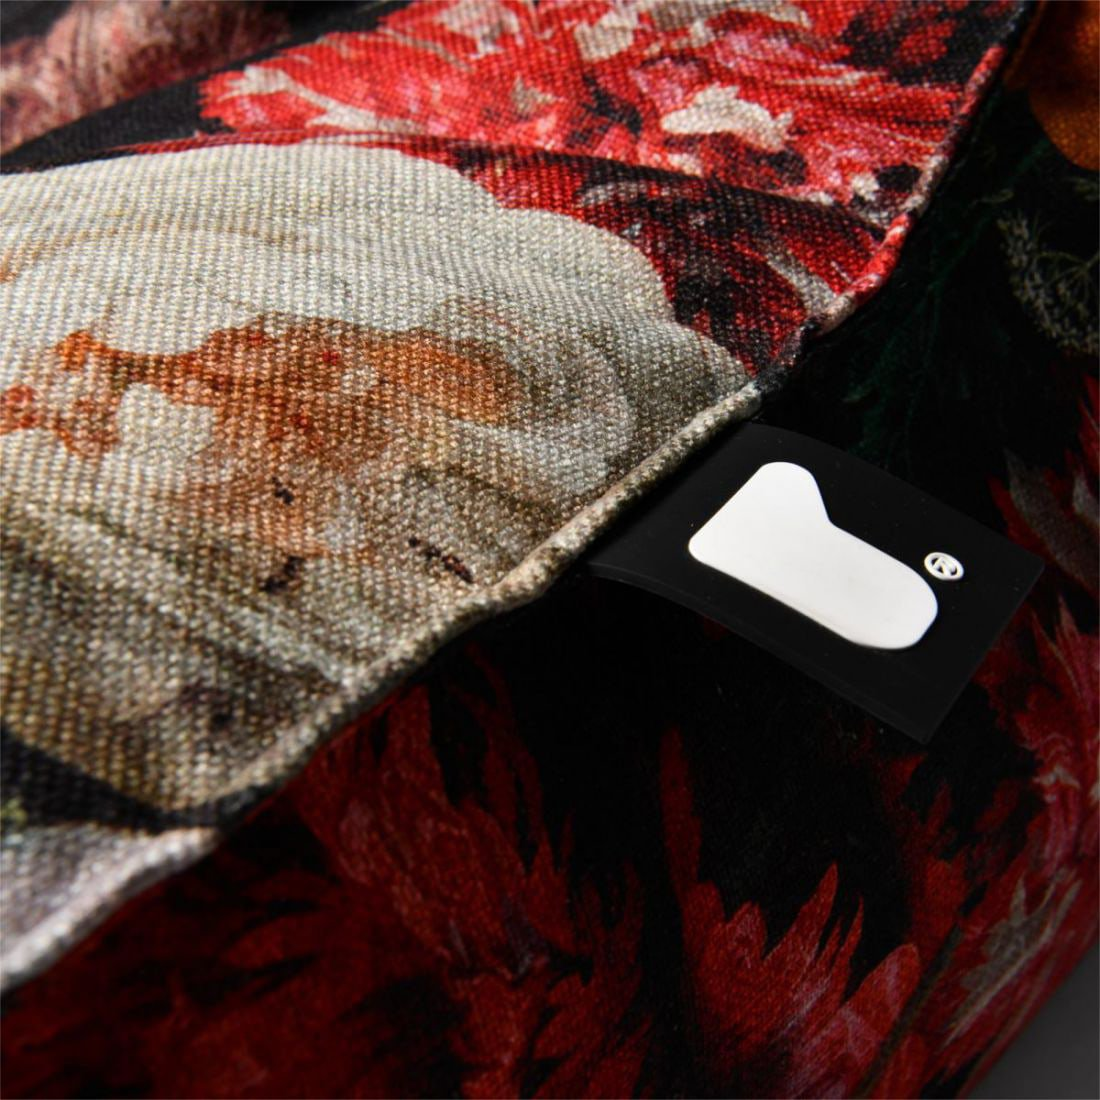 extreme lounging bbag mightyb indoor zitzak fashion floral